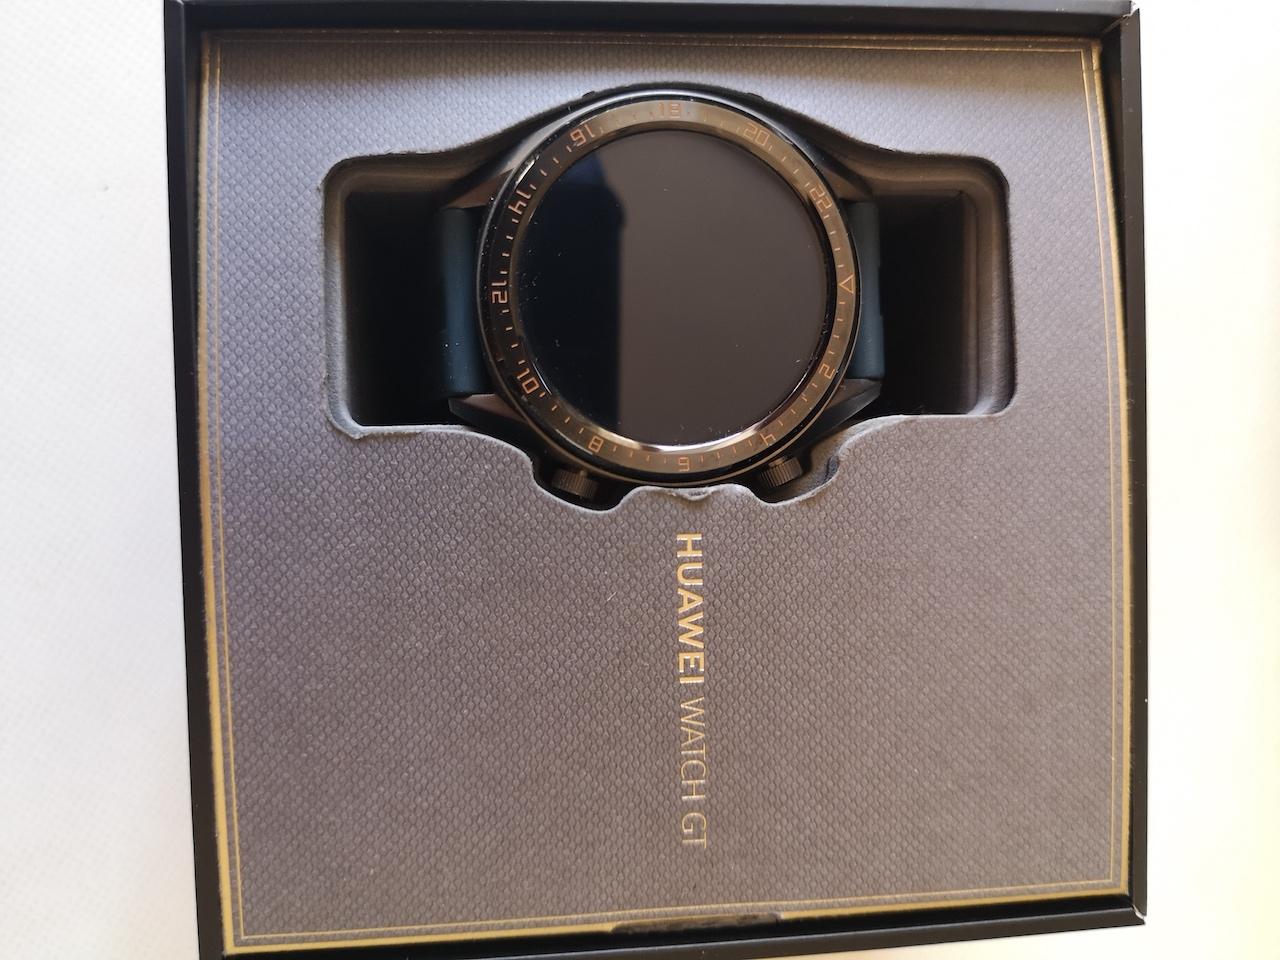 Huawei Watch GT 46mm, brand new